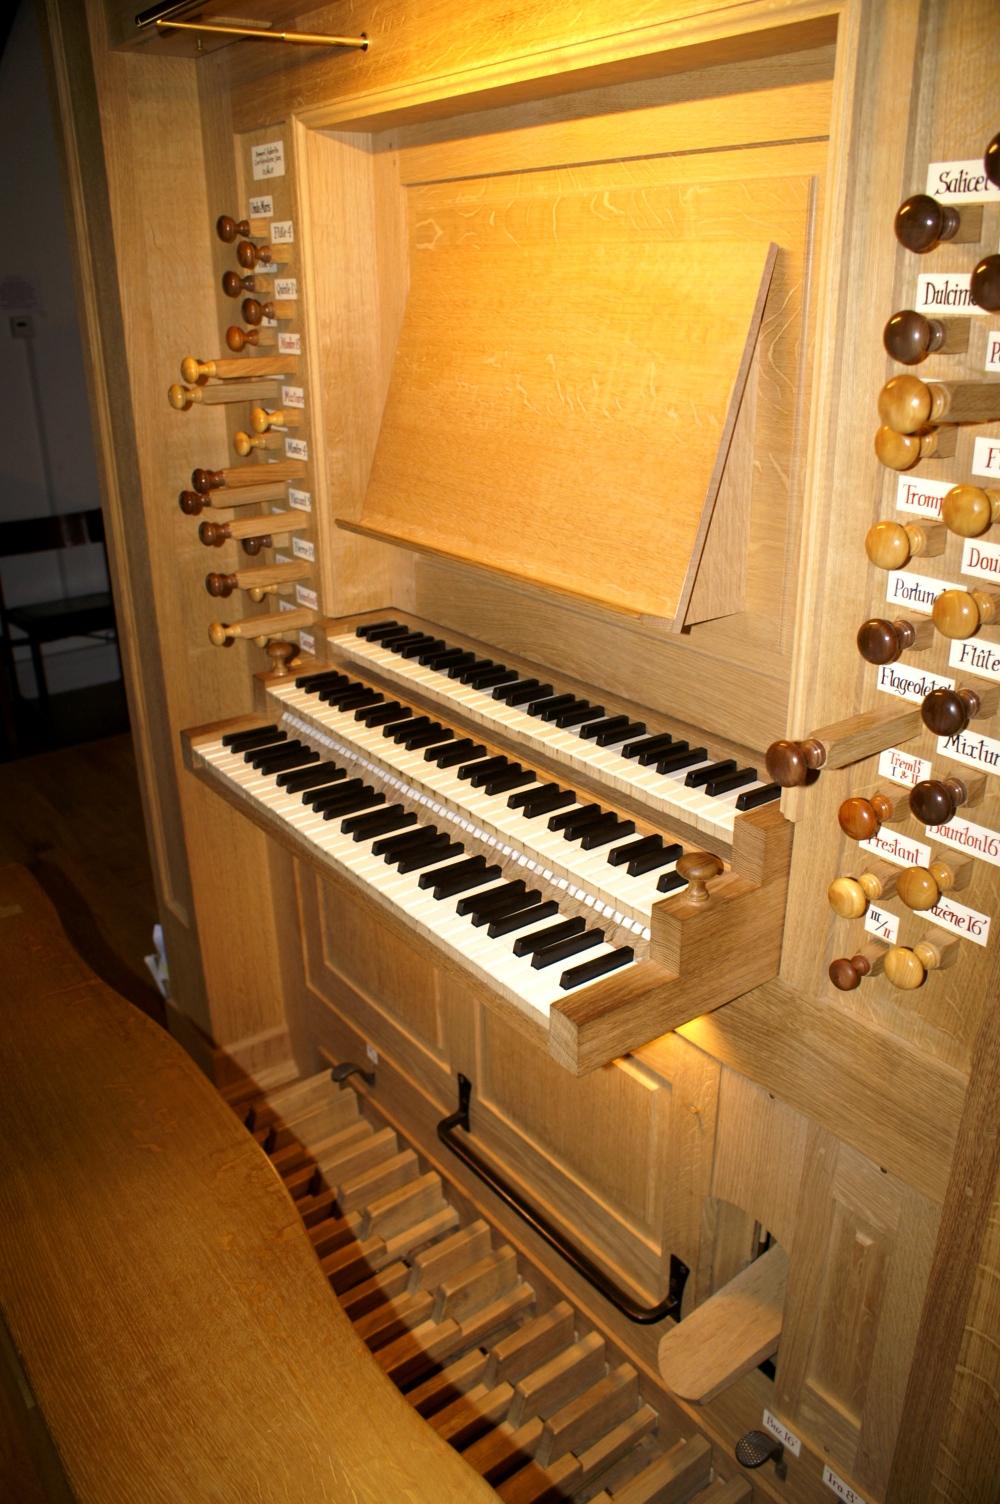 Aubertin organ console, St. John's College, St Giles (Photo: R Blanch)